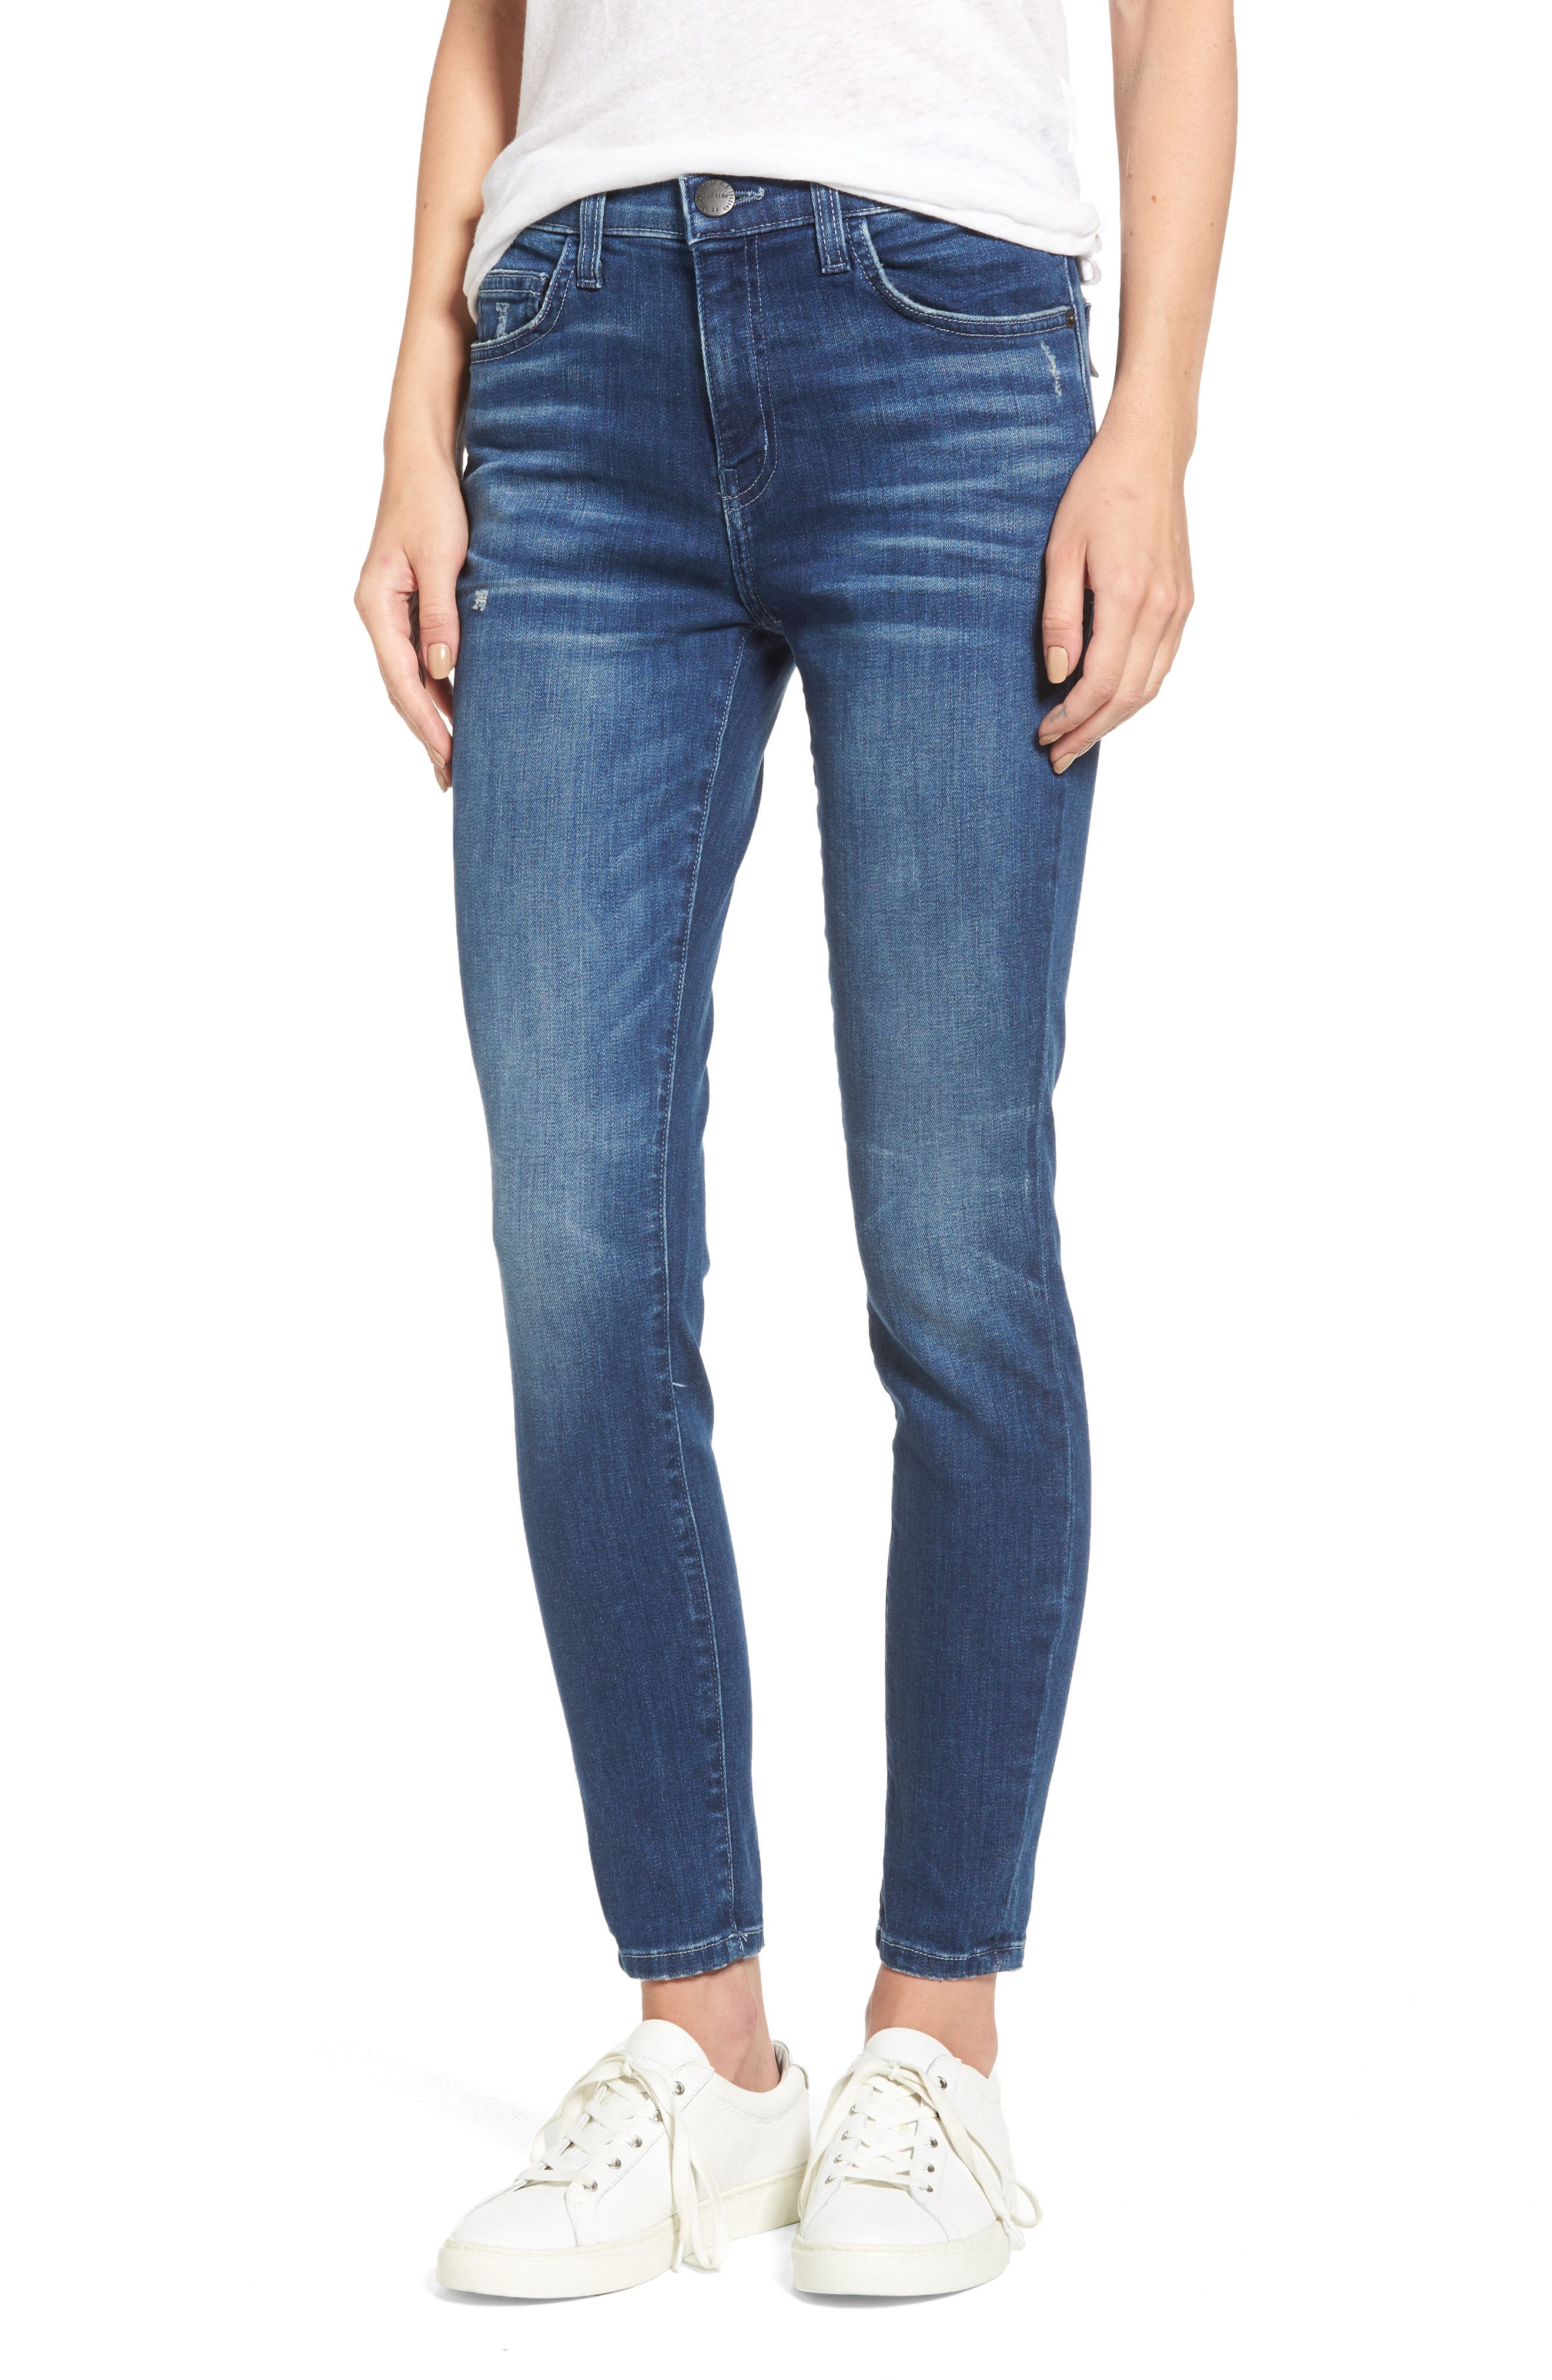 Main Image - Current/Elliott The Stiletto High Waist Skinny Jeans (Sahara Destroy)